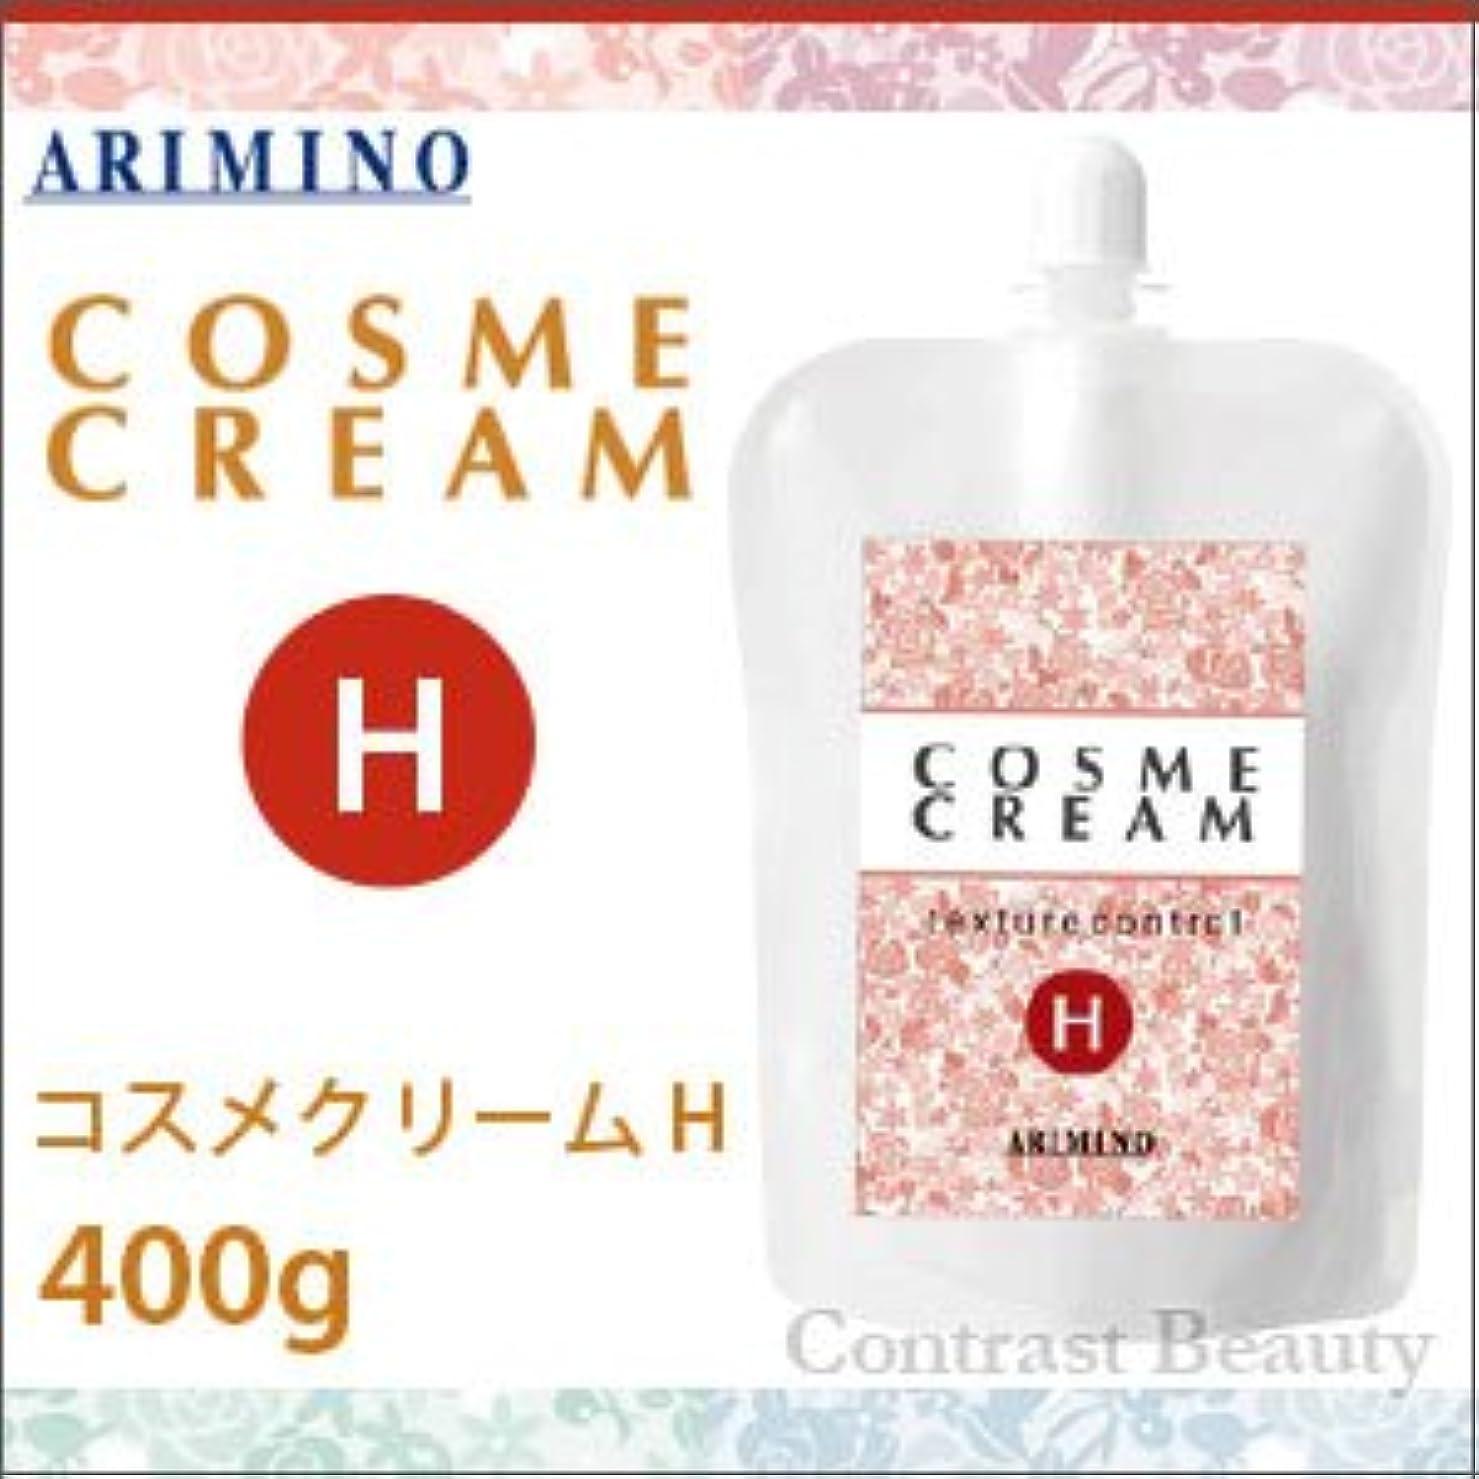 【X5個セット】 アリミノ コスメクリーム H 400g